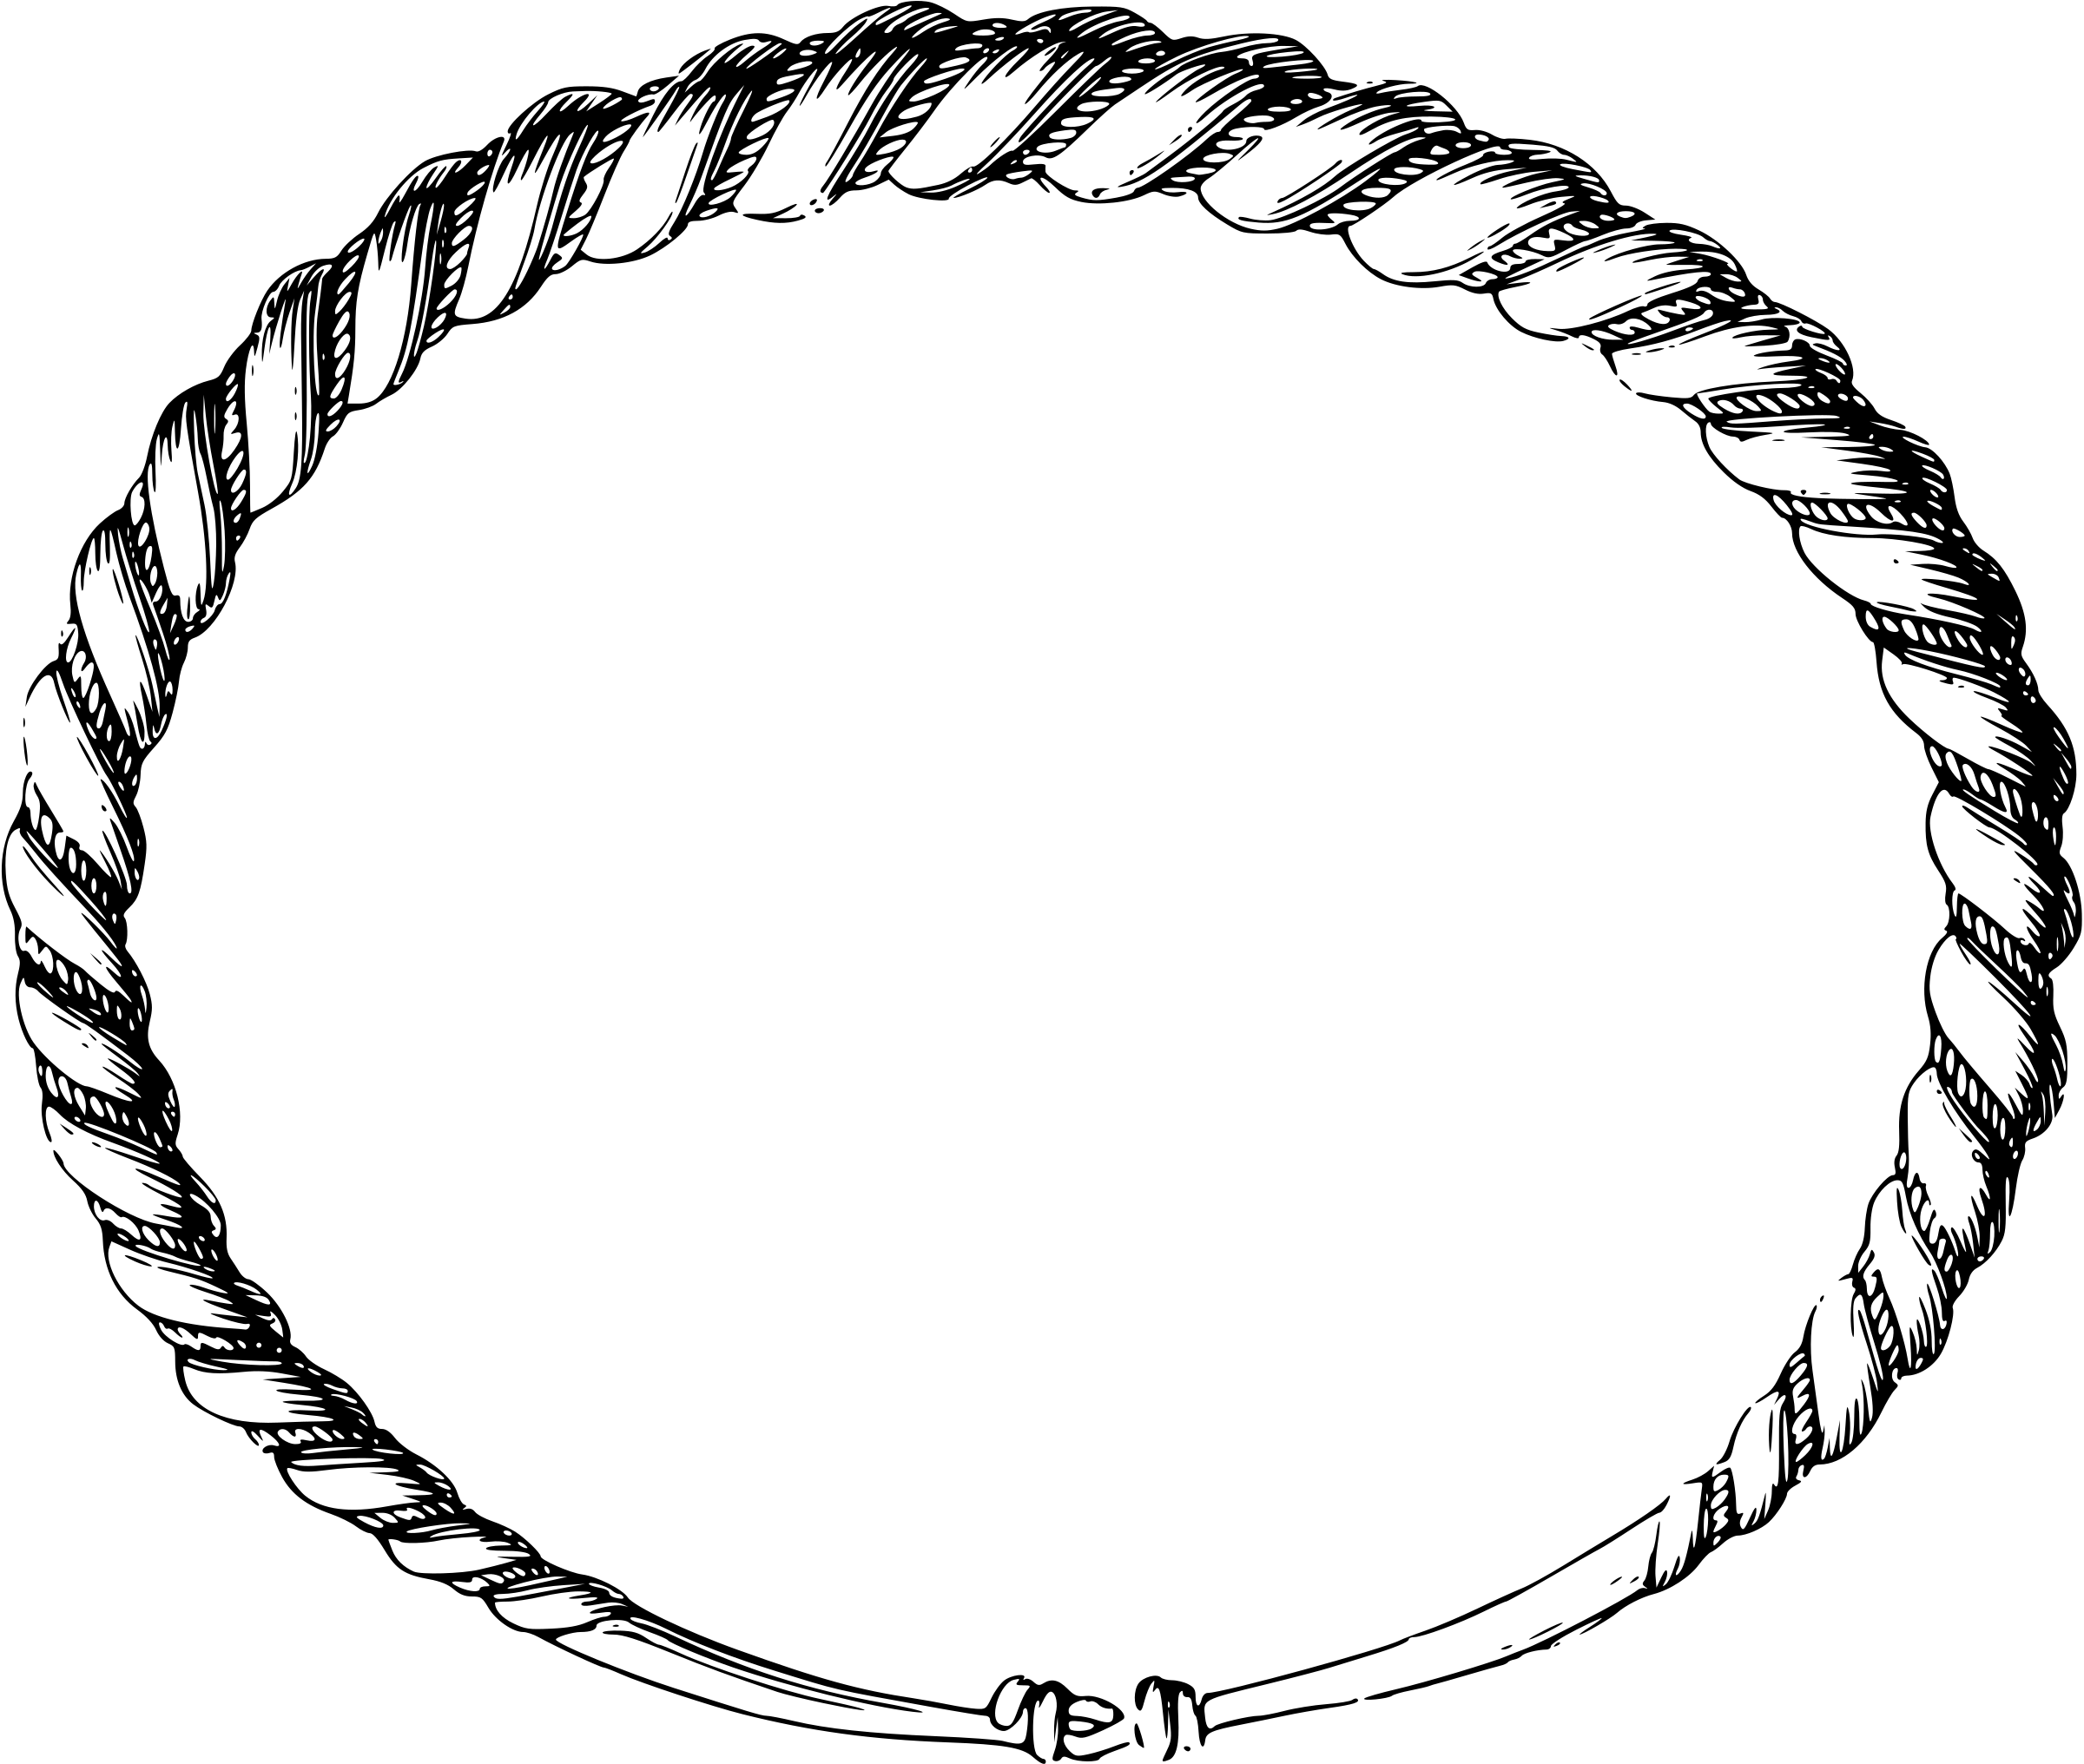 2400x2032 Clipart